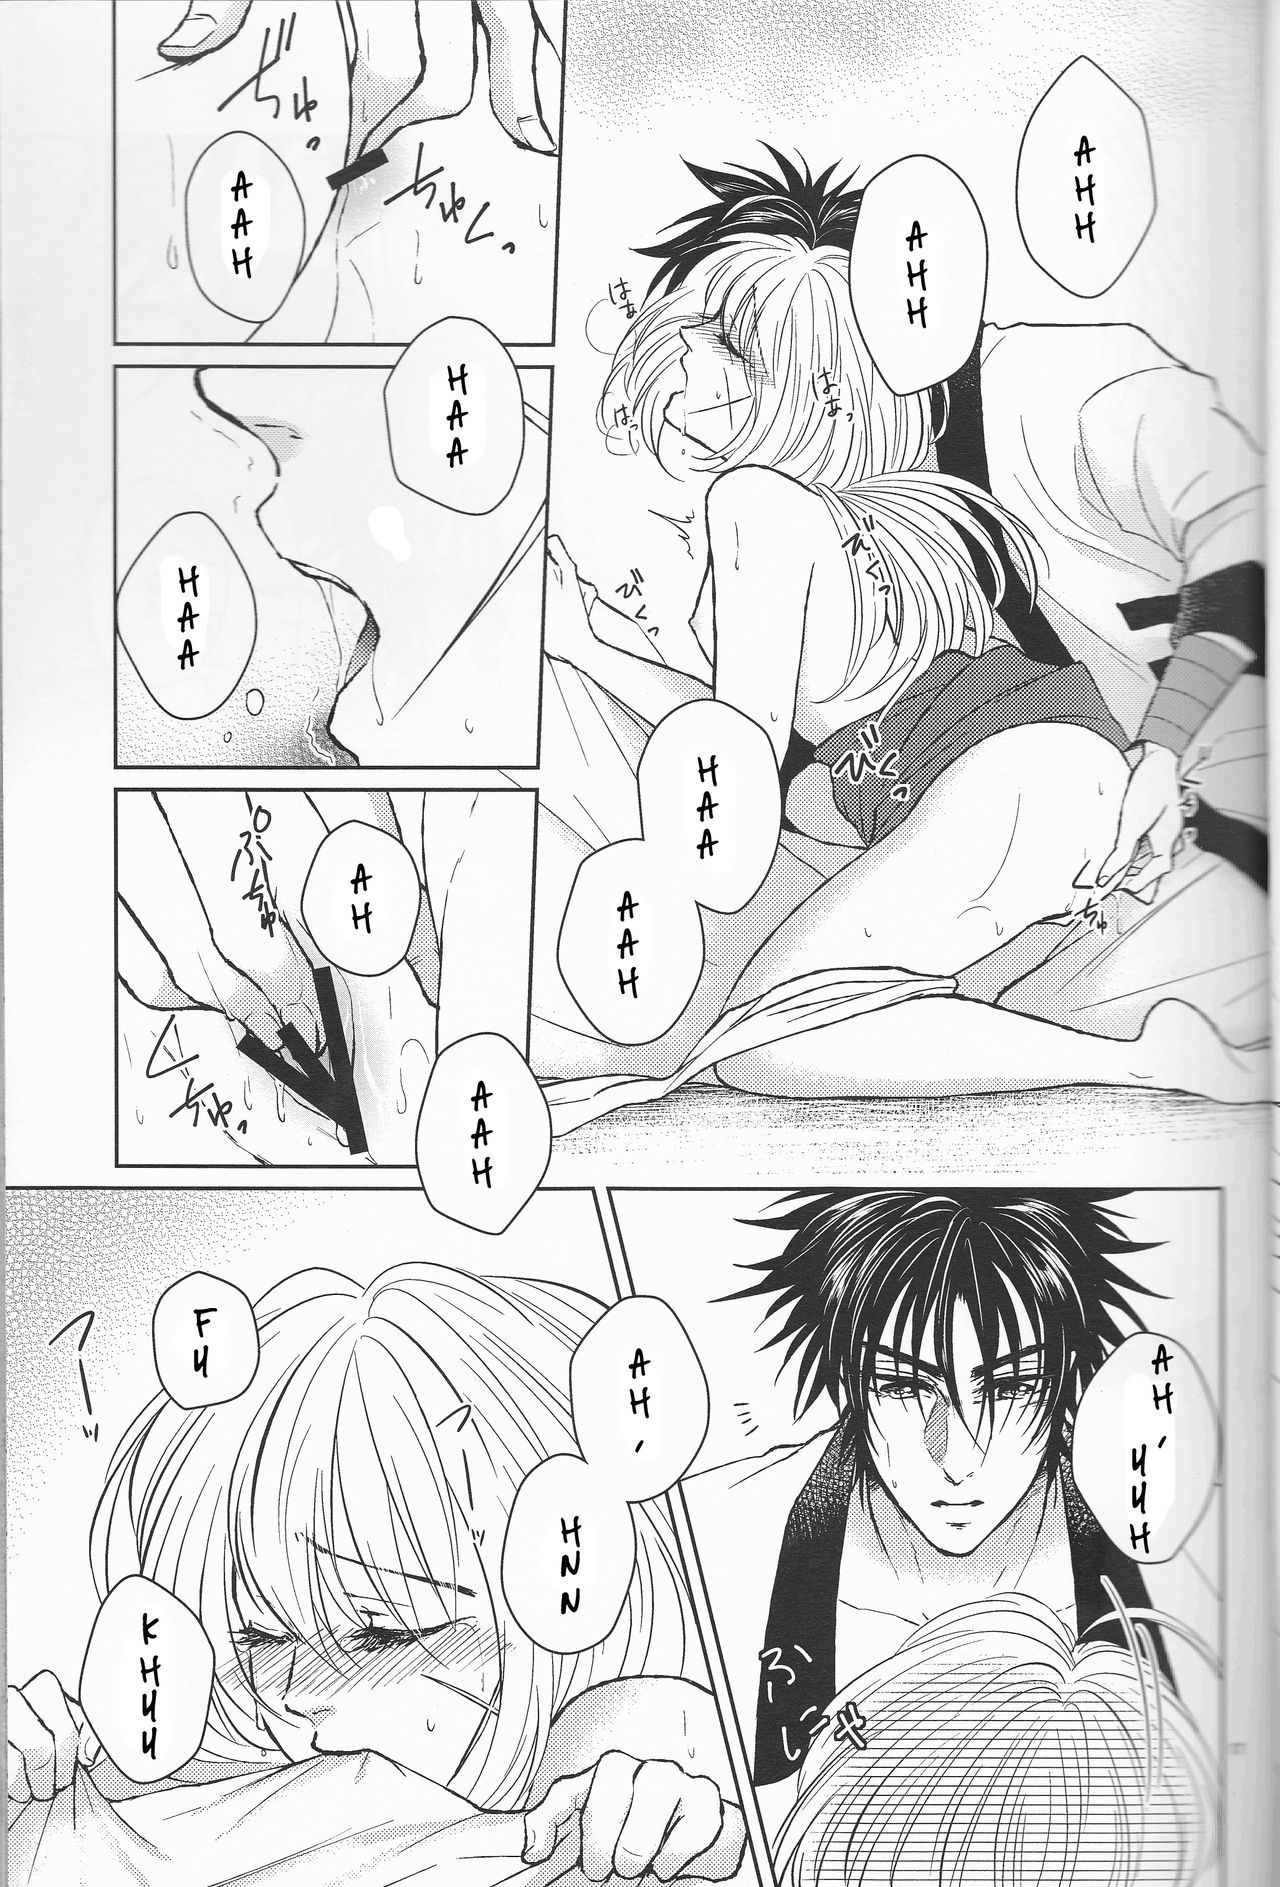 Hime ken ryoran page 17